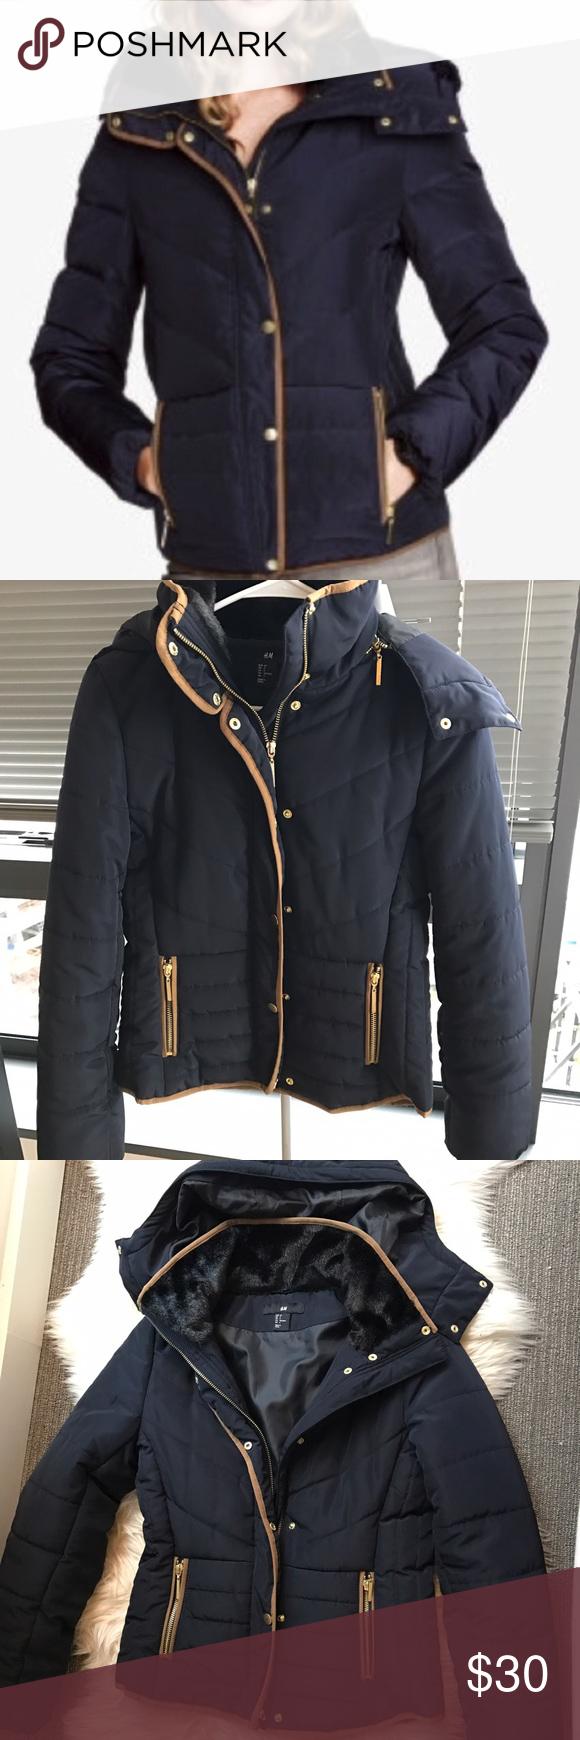 NWOT H&M puffer coat Puffer coat, Warm puffer jackets, H